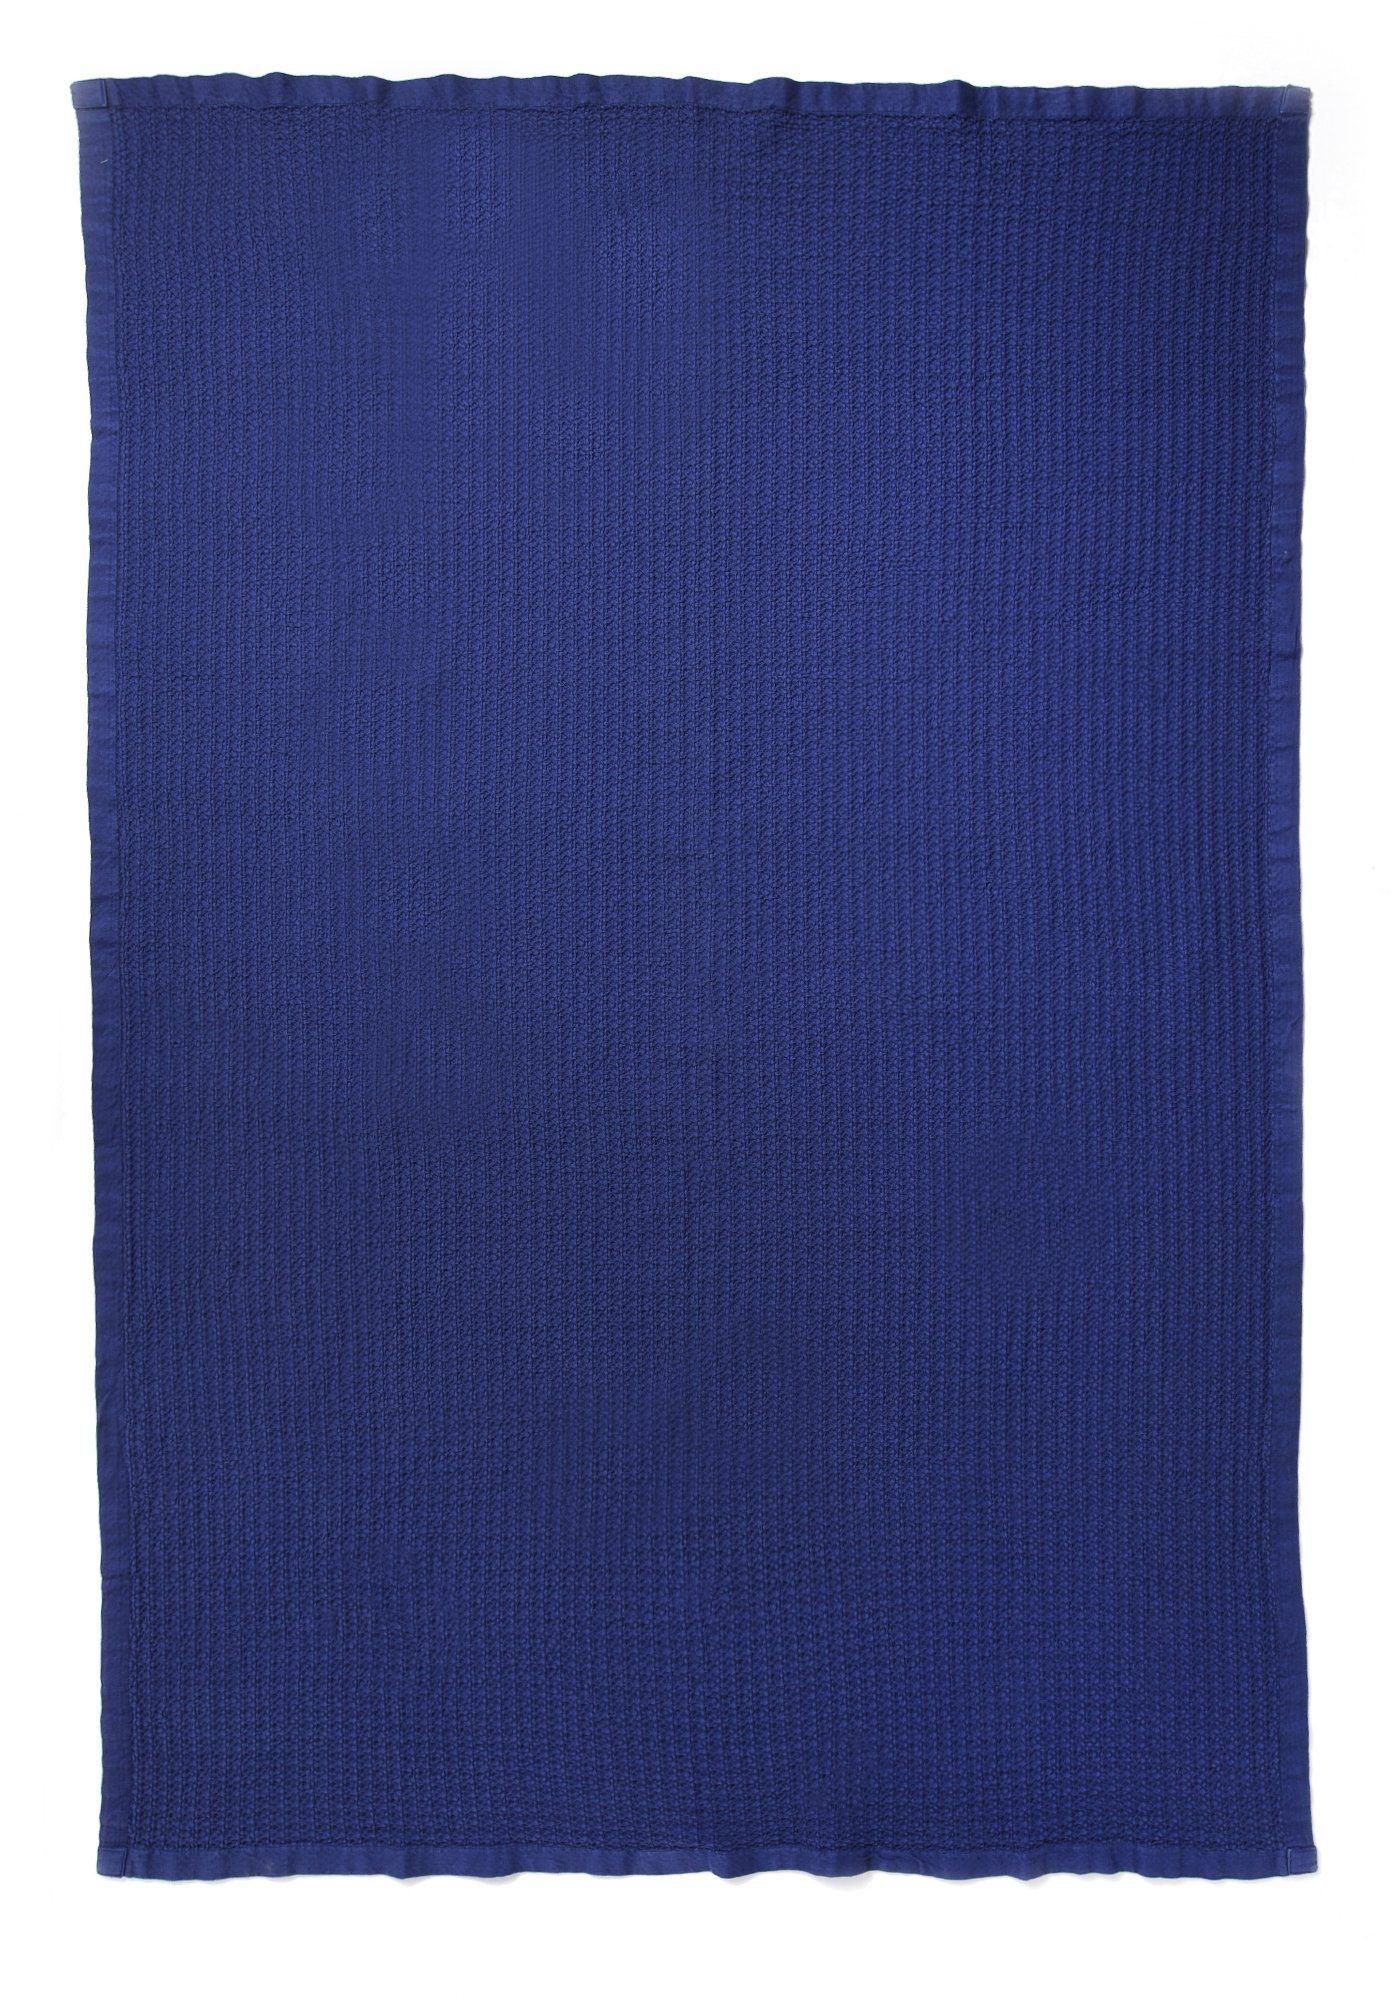 casa di bassi tagesdecke milano blau online kaufen bei woonio. Black Bedroom Furniture Sets. Home Design Ideas